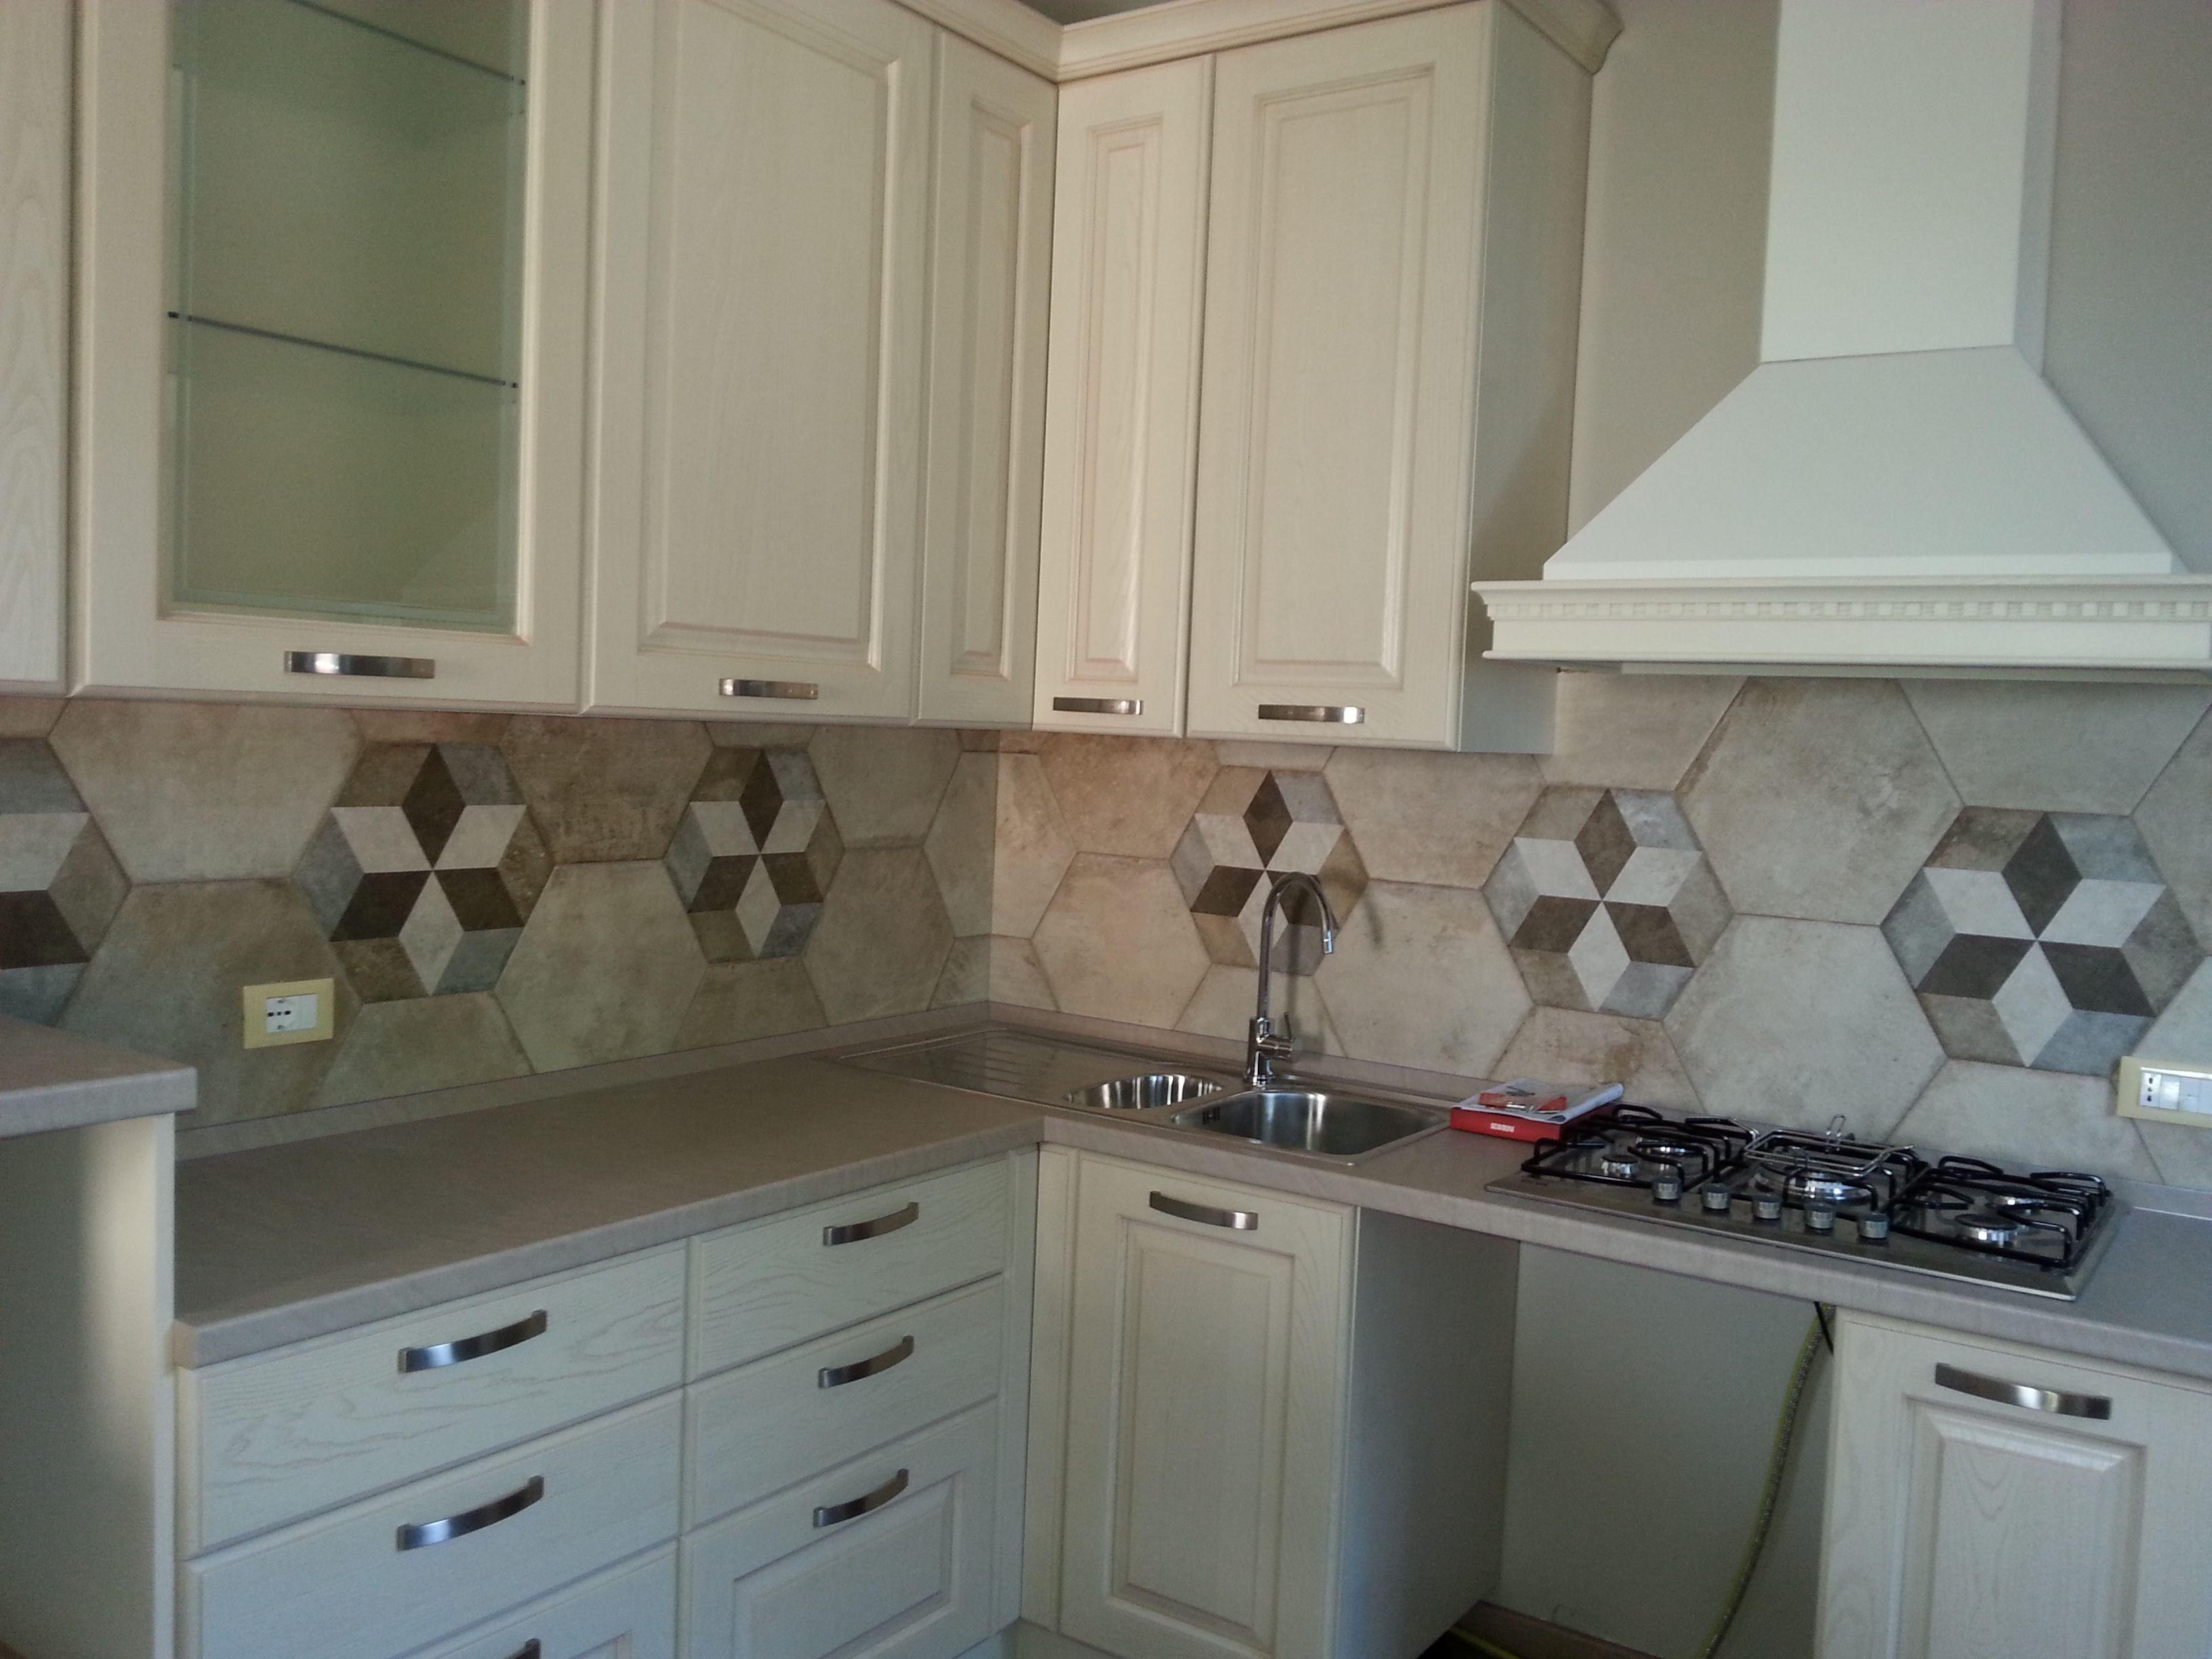 Ceramicafioranese heritage rivestimento cucina con piastrelle esagonali i nostri lavori - Piastrelle cucina ...